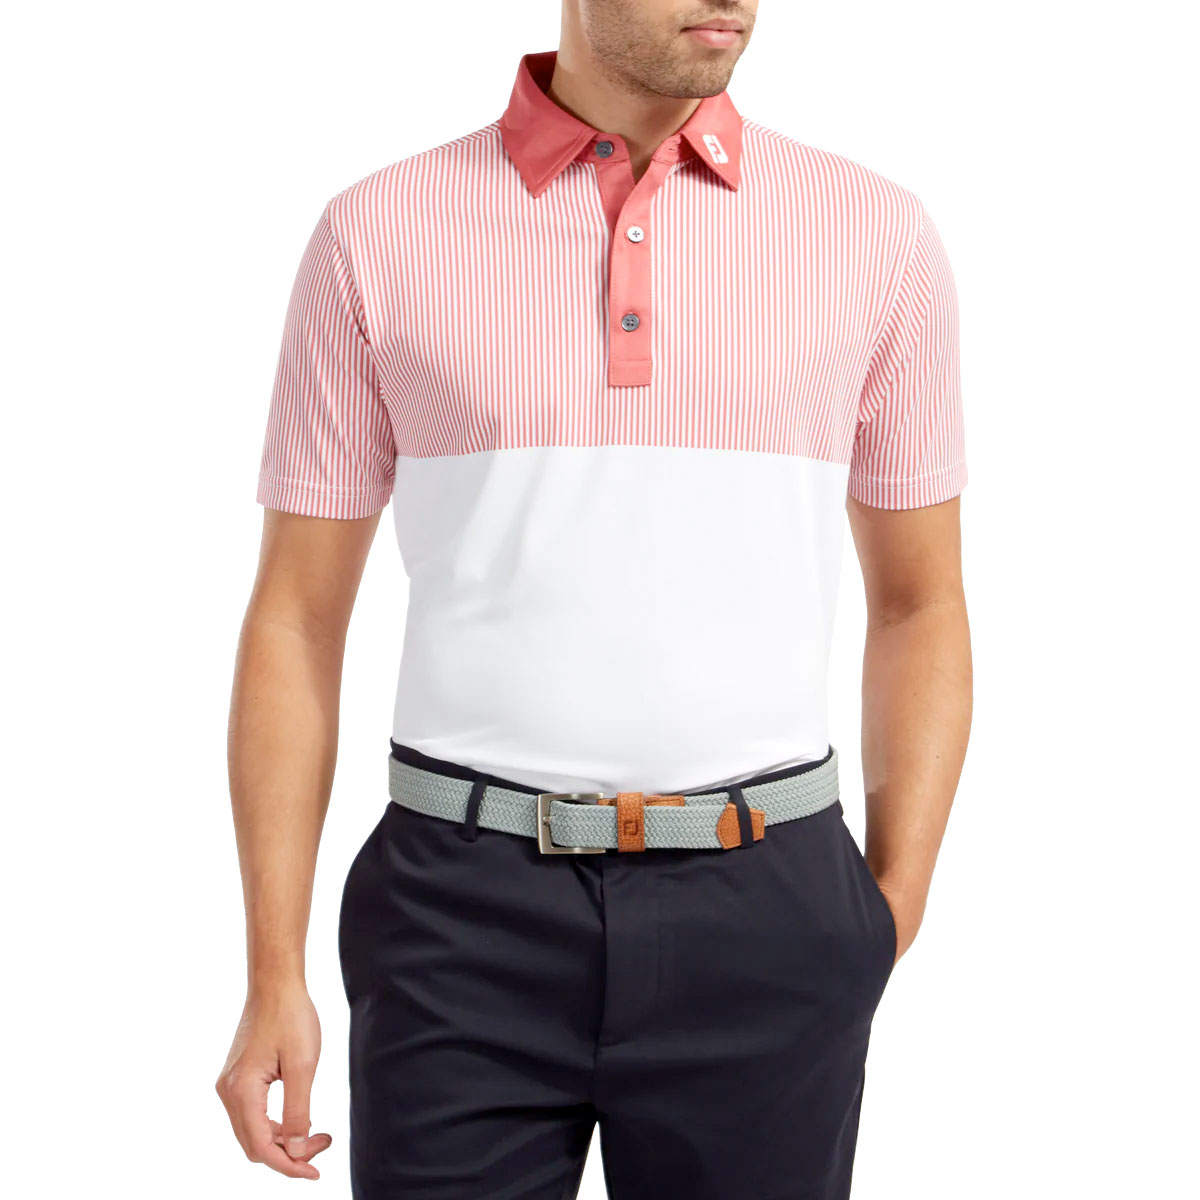 FootJoy Smooth Pique Engineered Vertical Print Mens Golf Polo Shirt